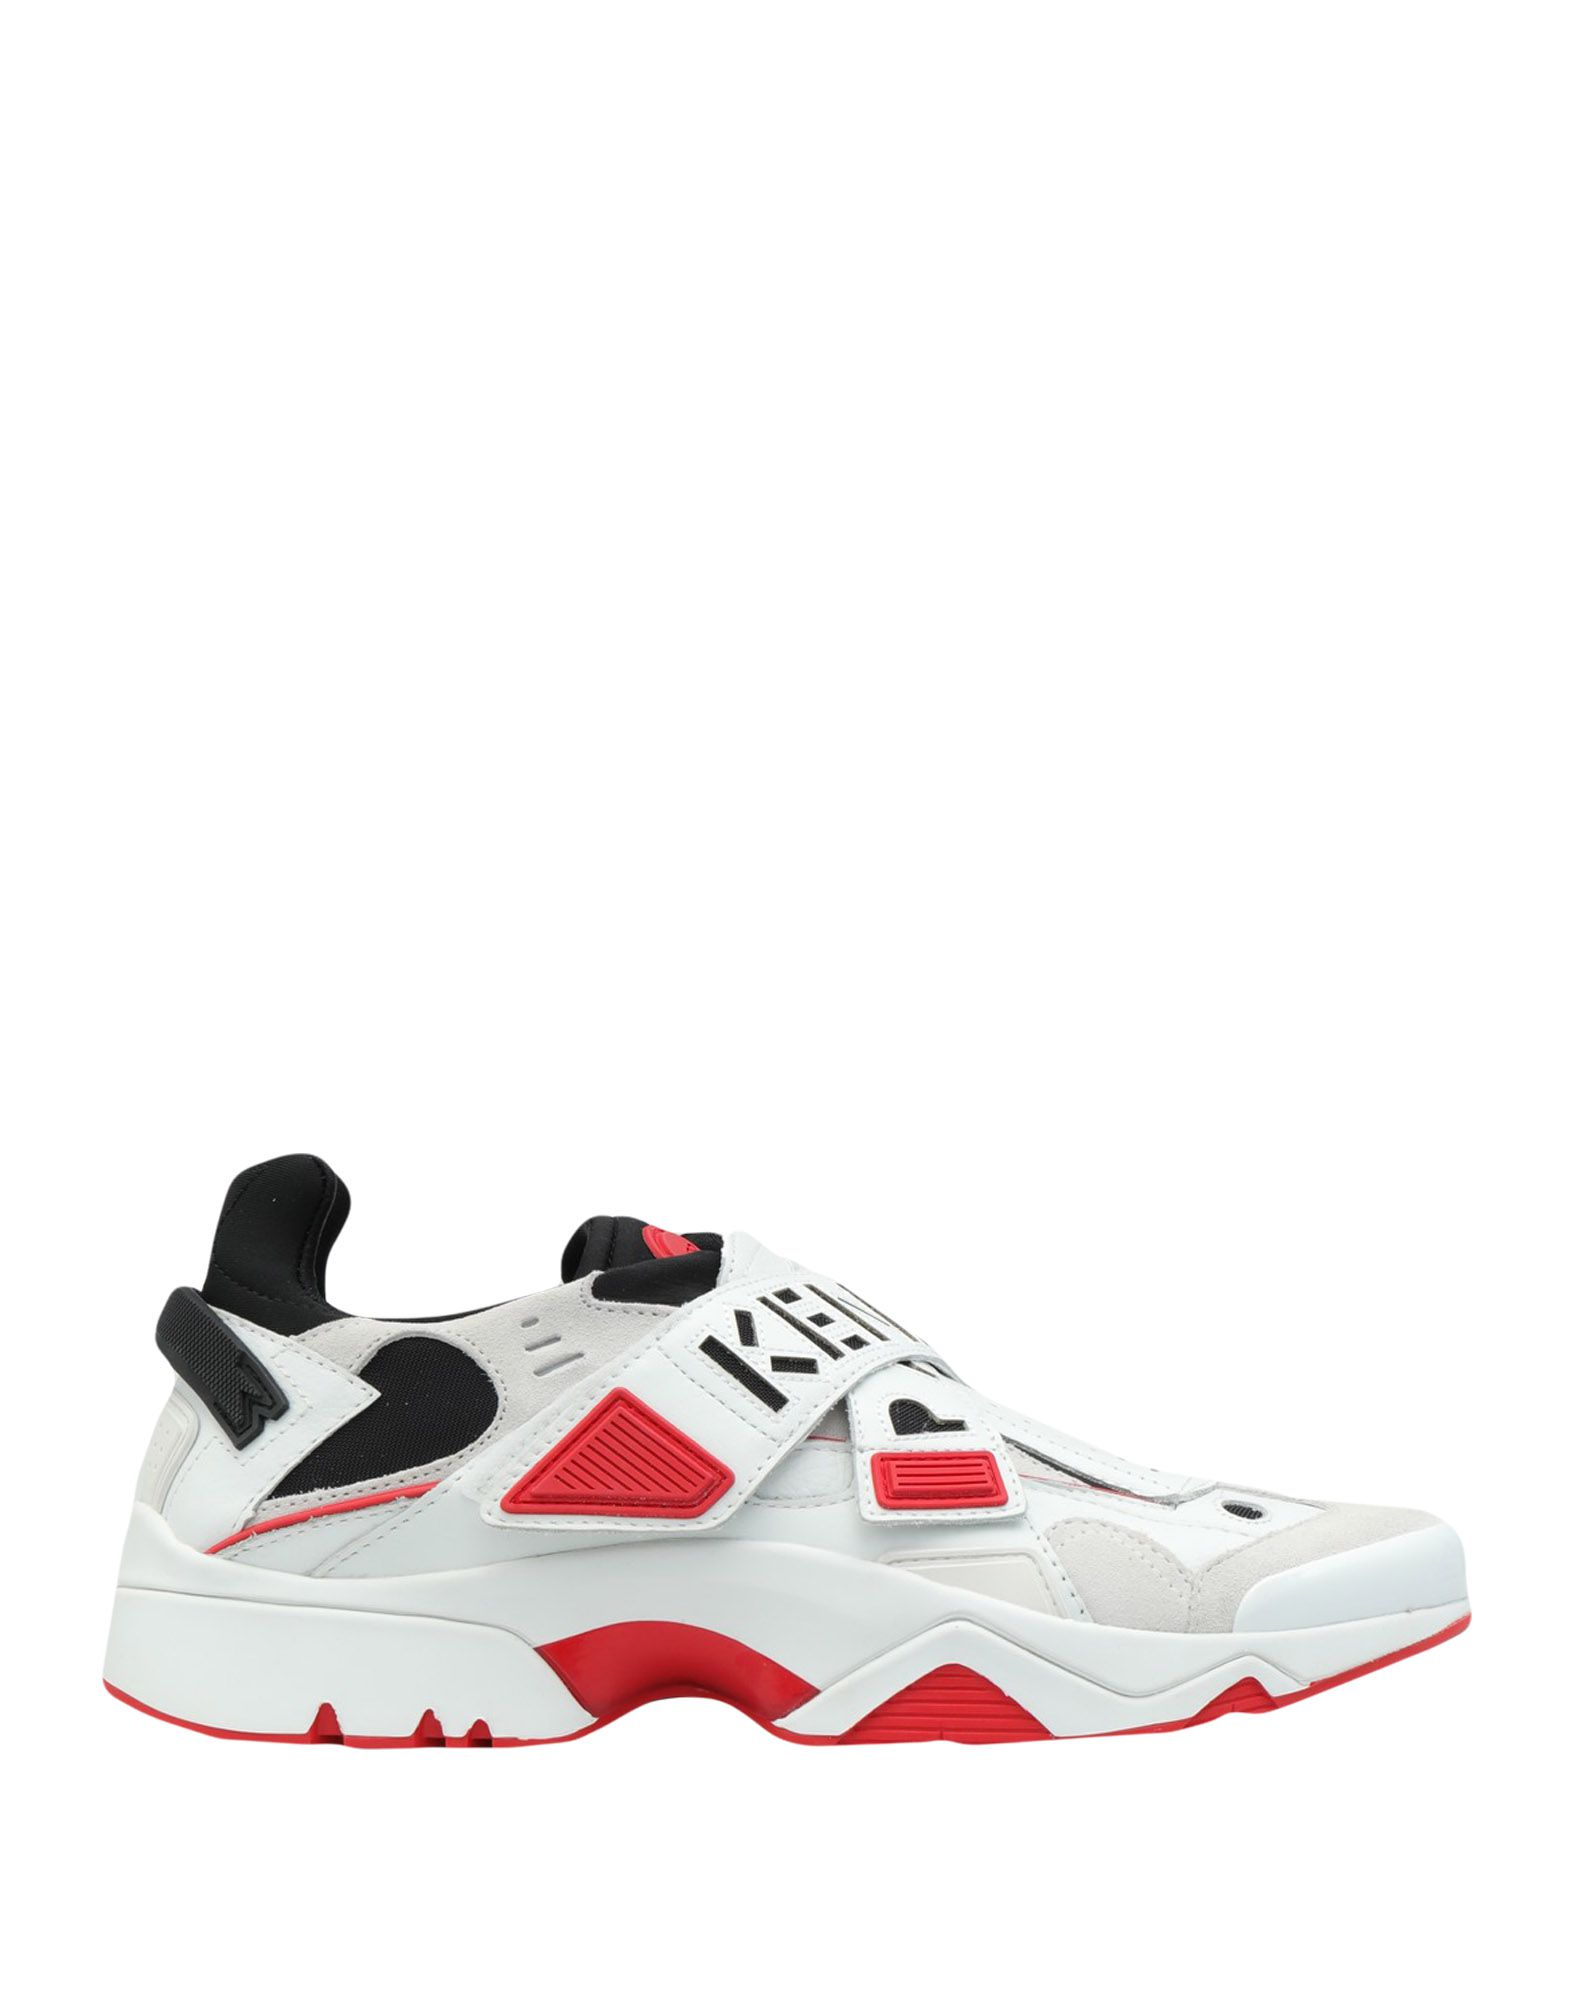 Kenzo Sonic Velcro Sneakers In White